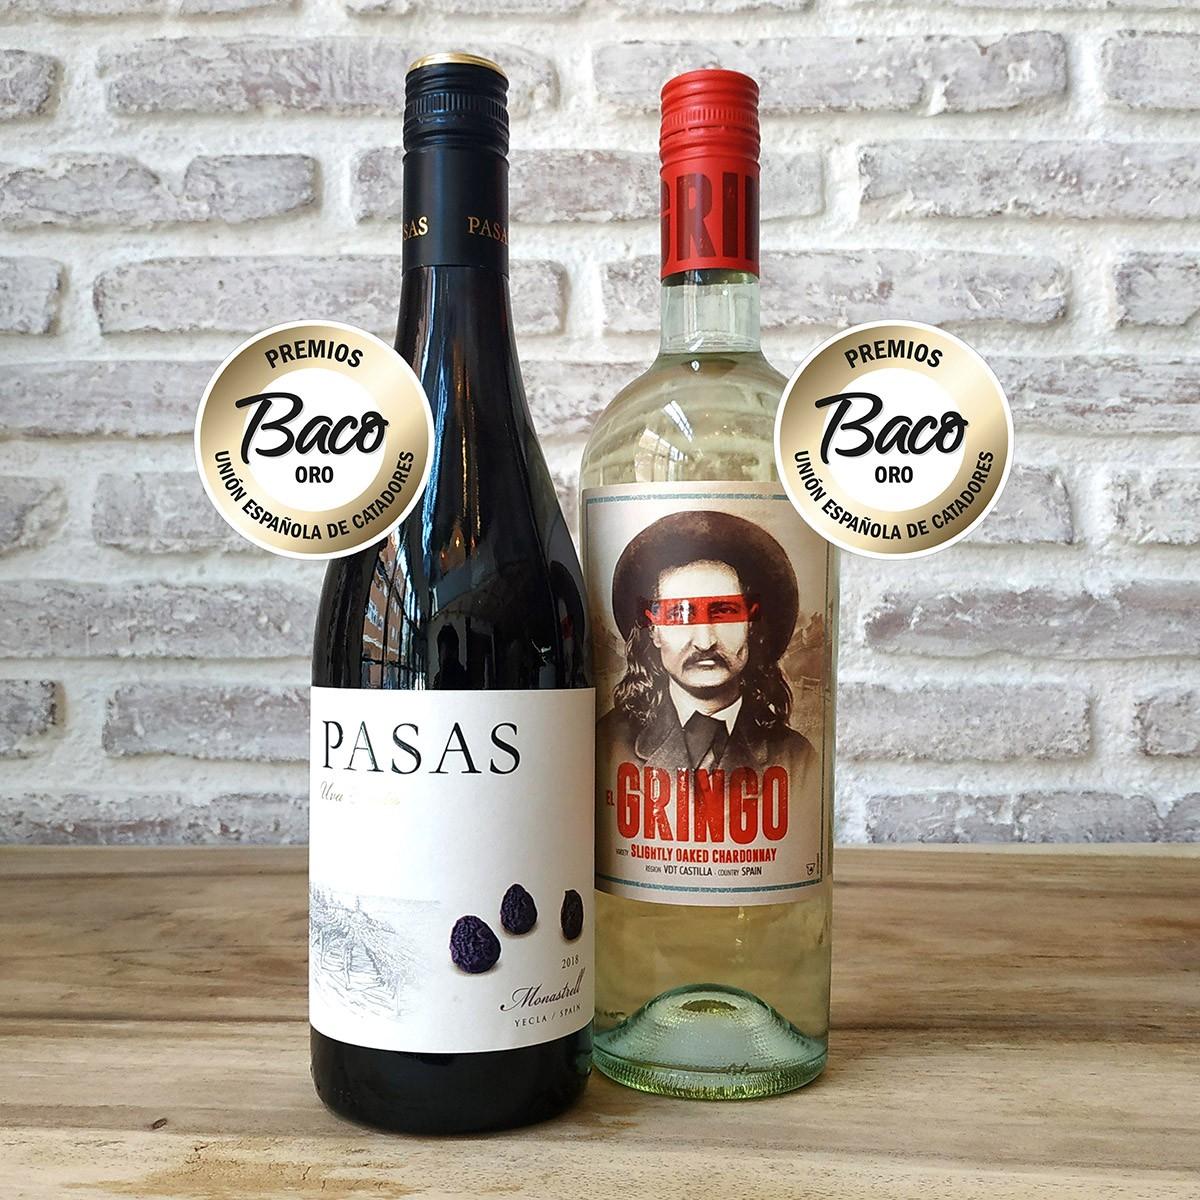 Hammeken Cellars awarded with 2 Golden Baco for El Gringo Slightly Oaked Chardonnay and Pasas Uva Tinta